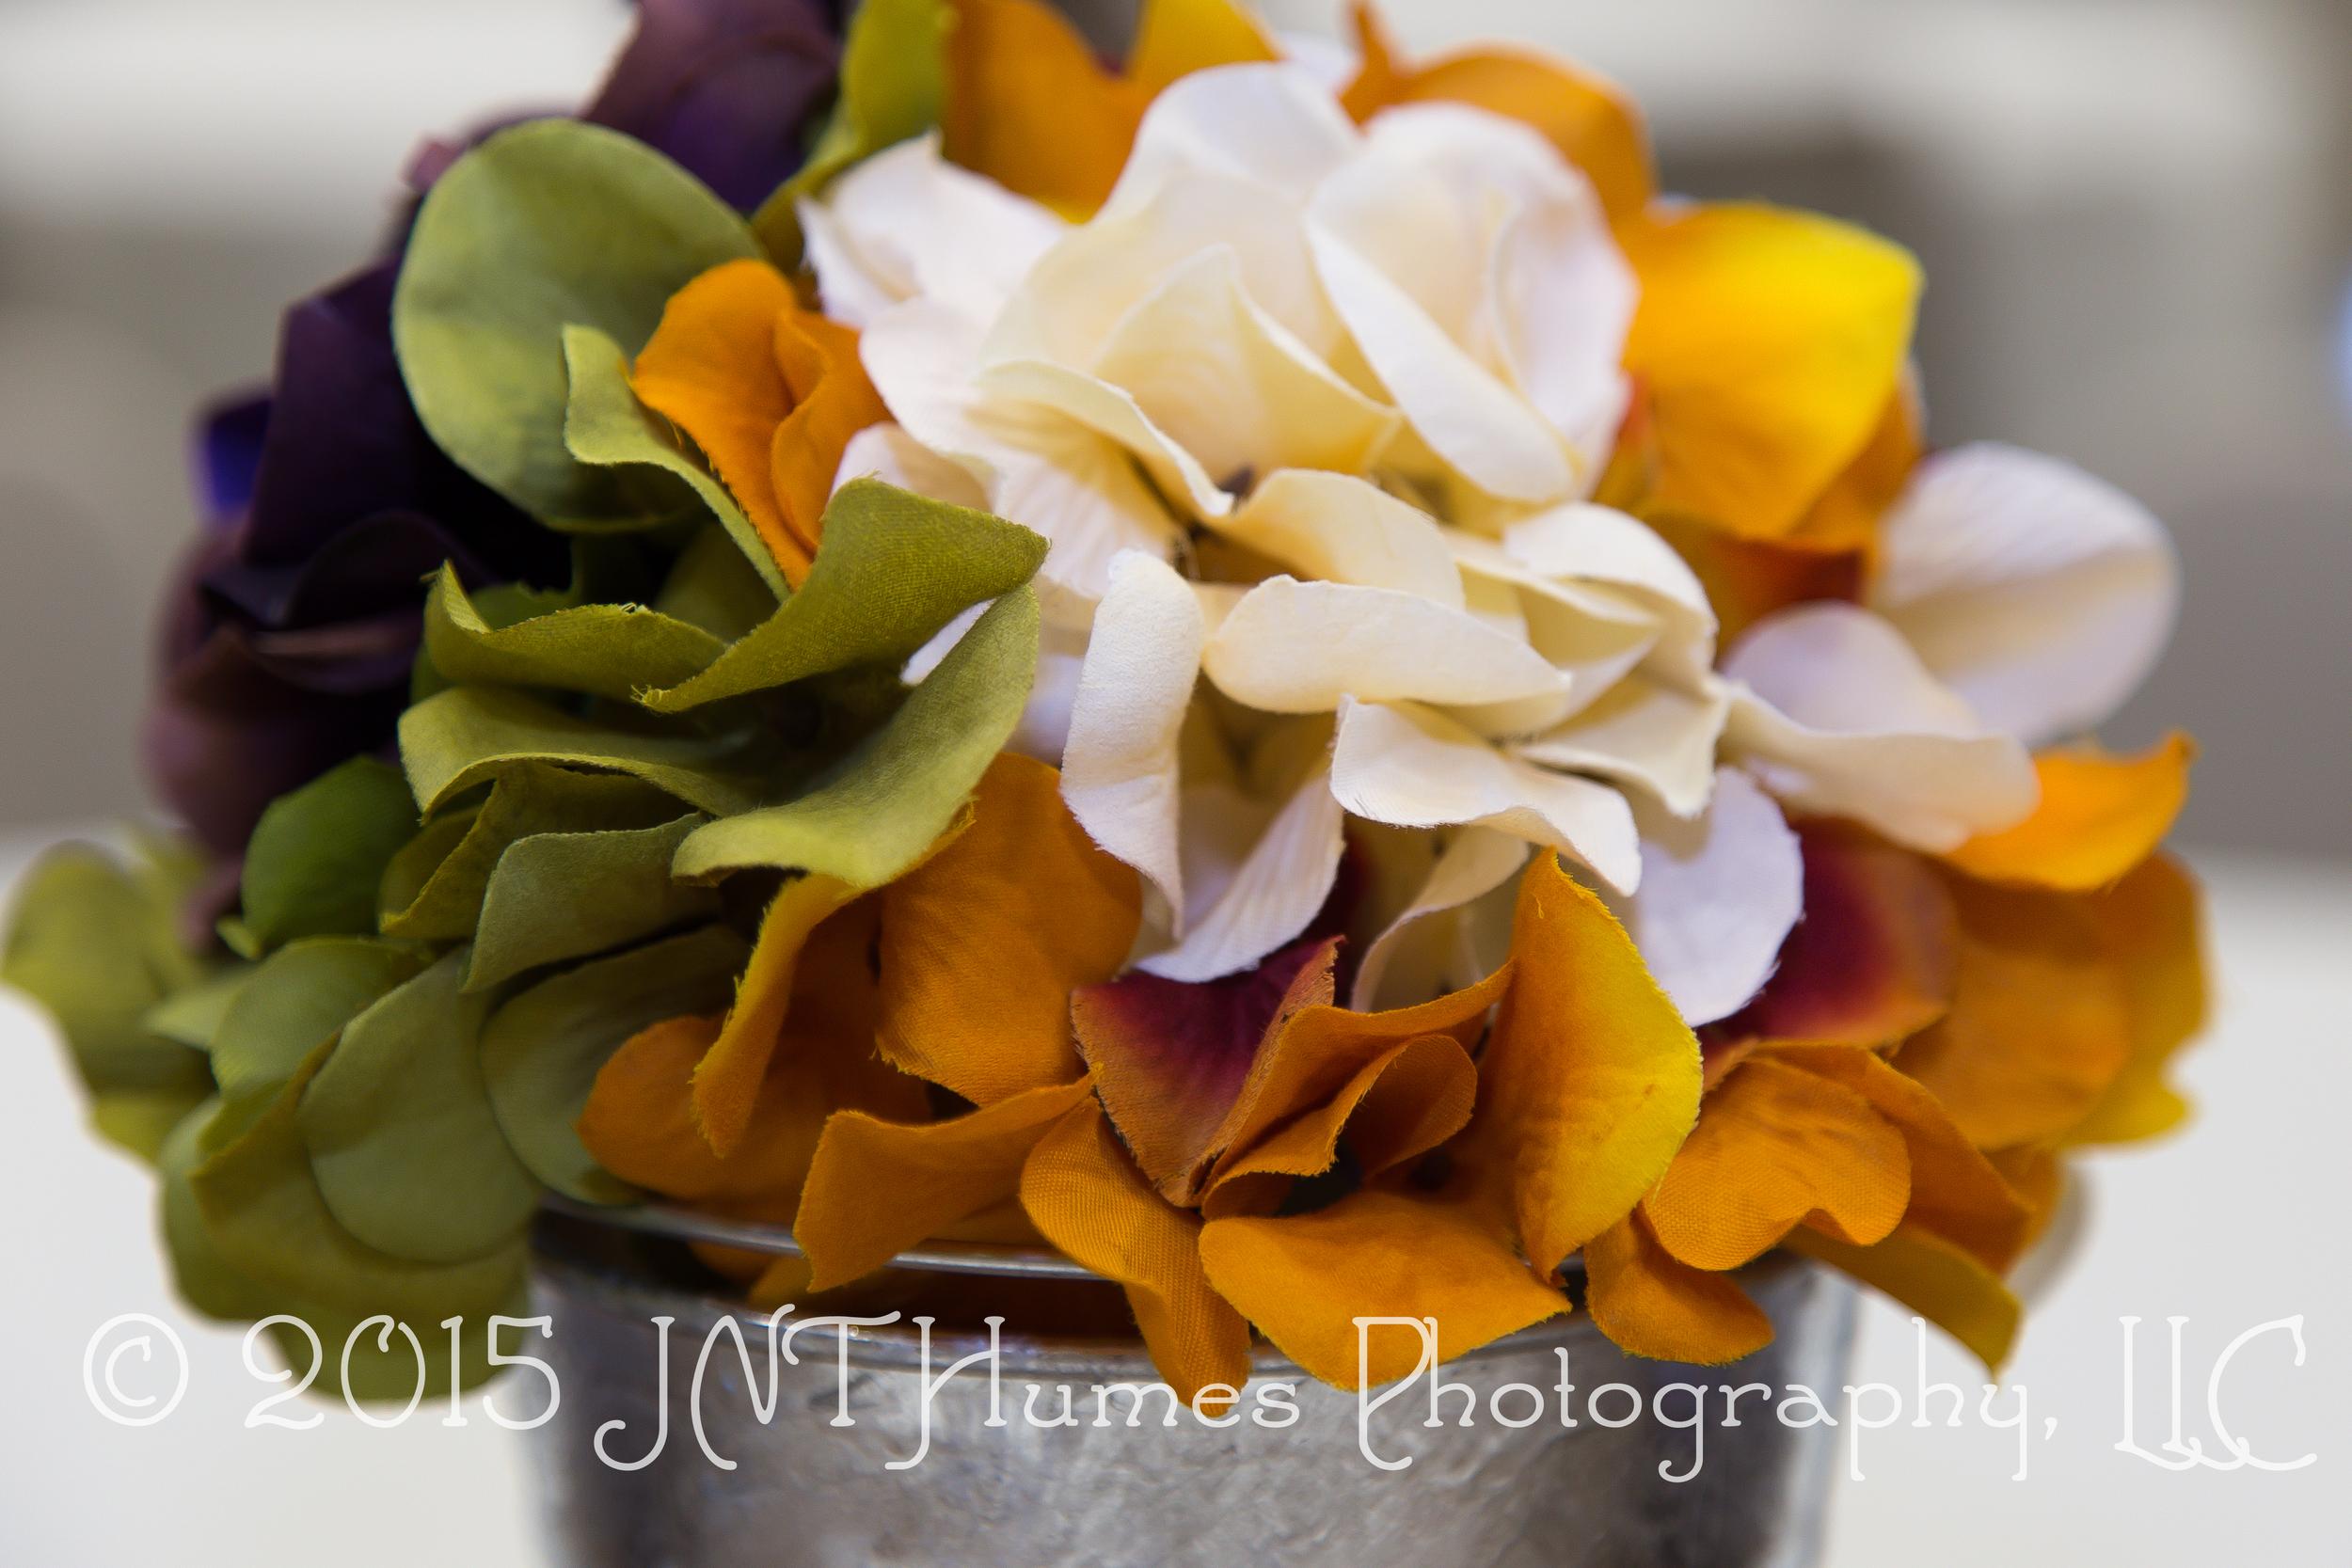 IMG_13102015-09-19© 2015 JNT Humes Photography, LLC.jpg